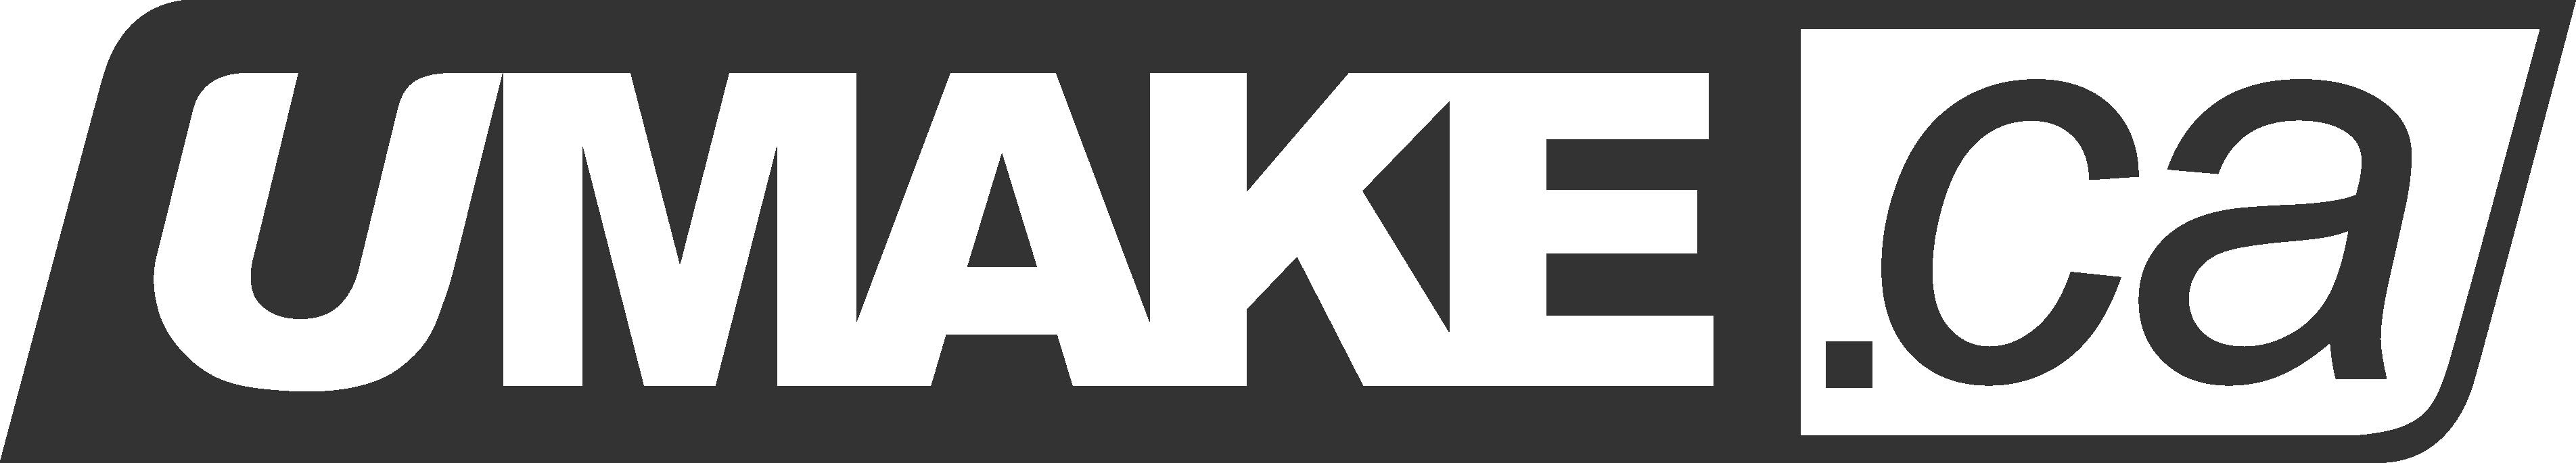 uMake.ca